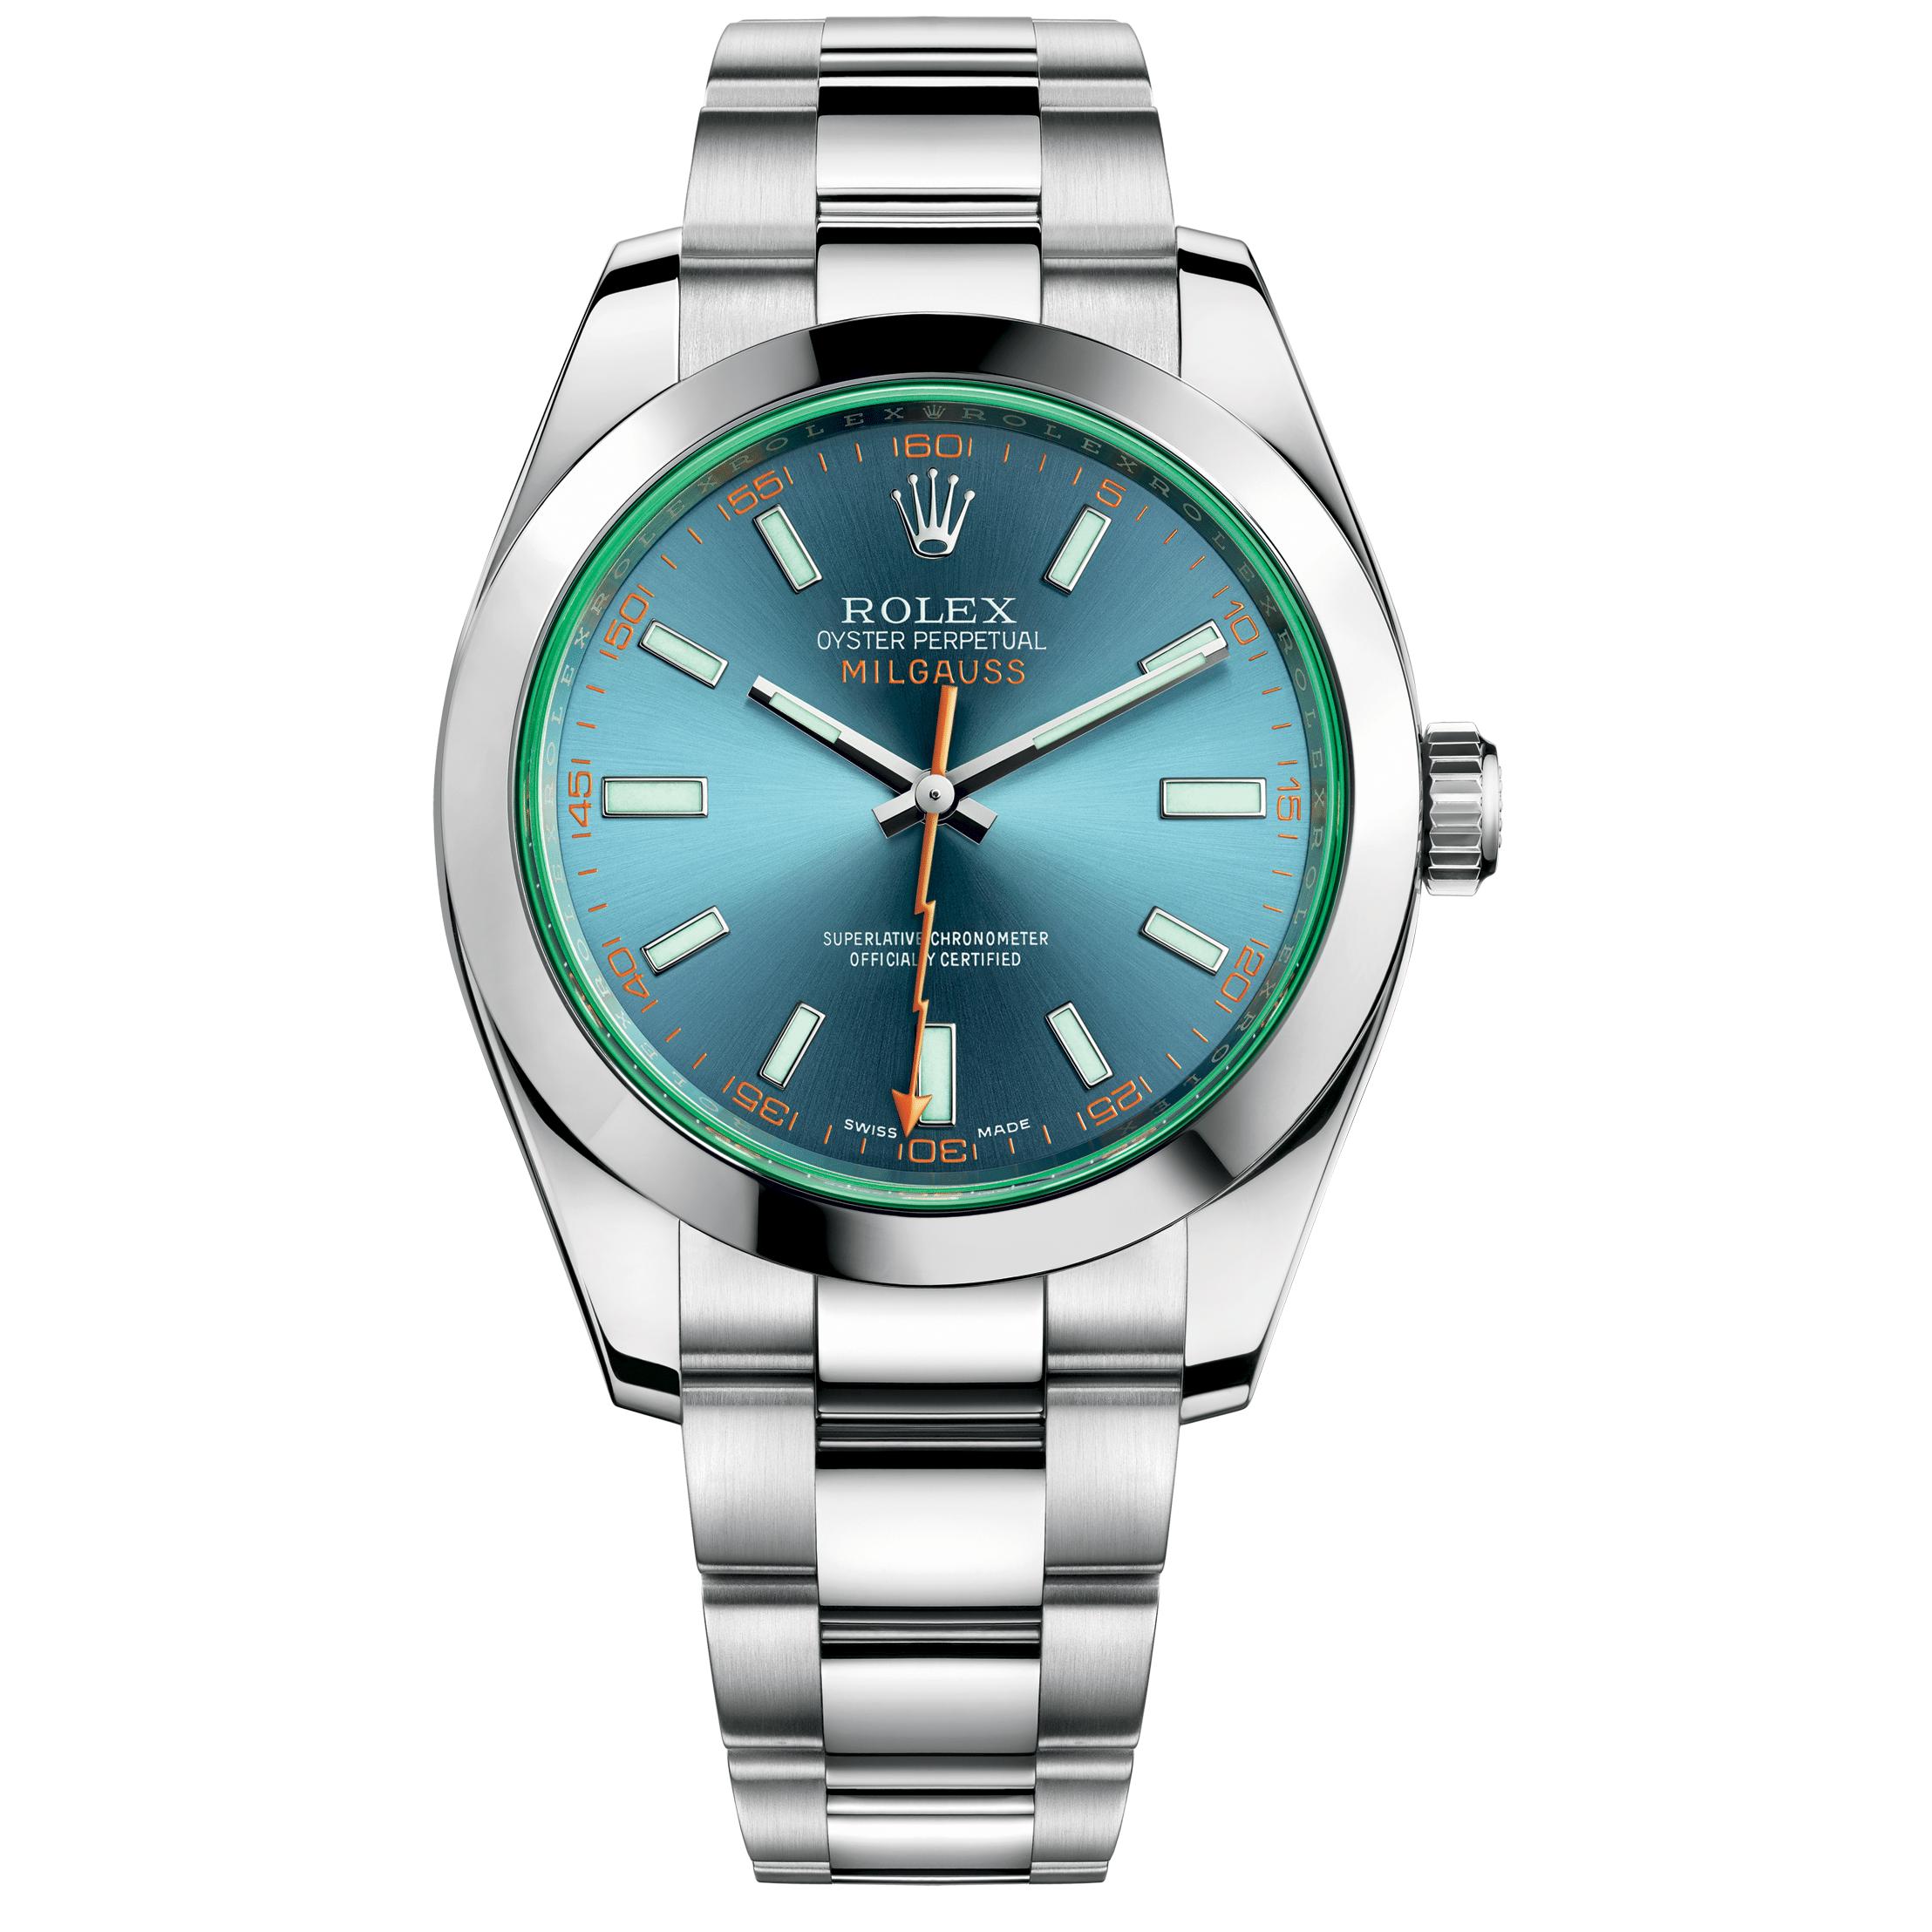 Rolex 116400 Milgauss GV-0002